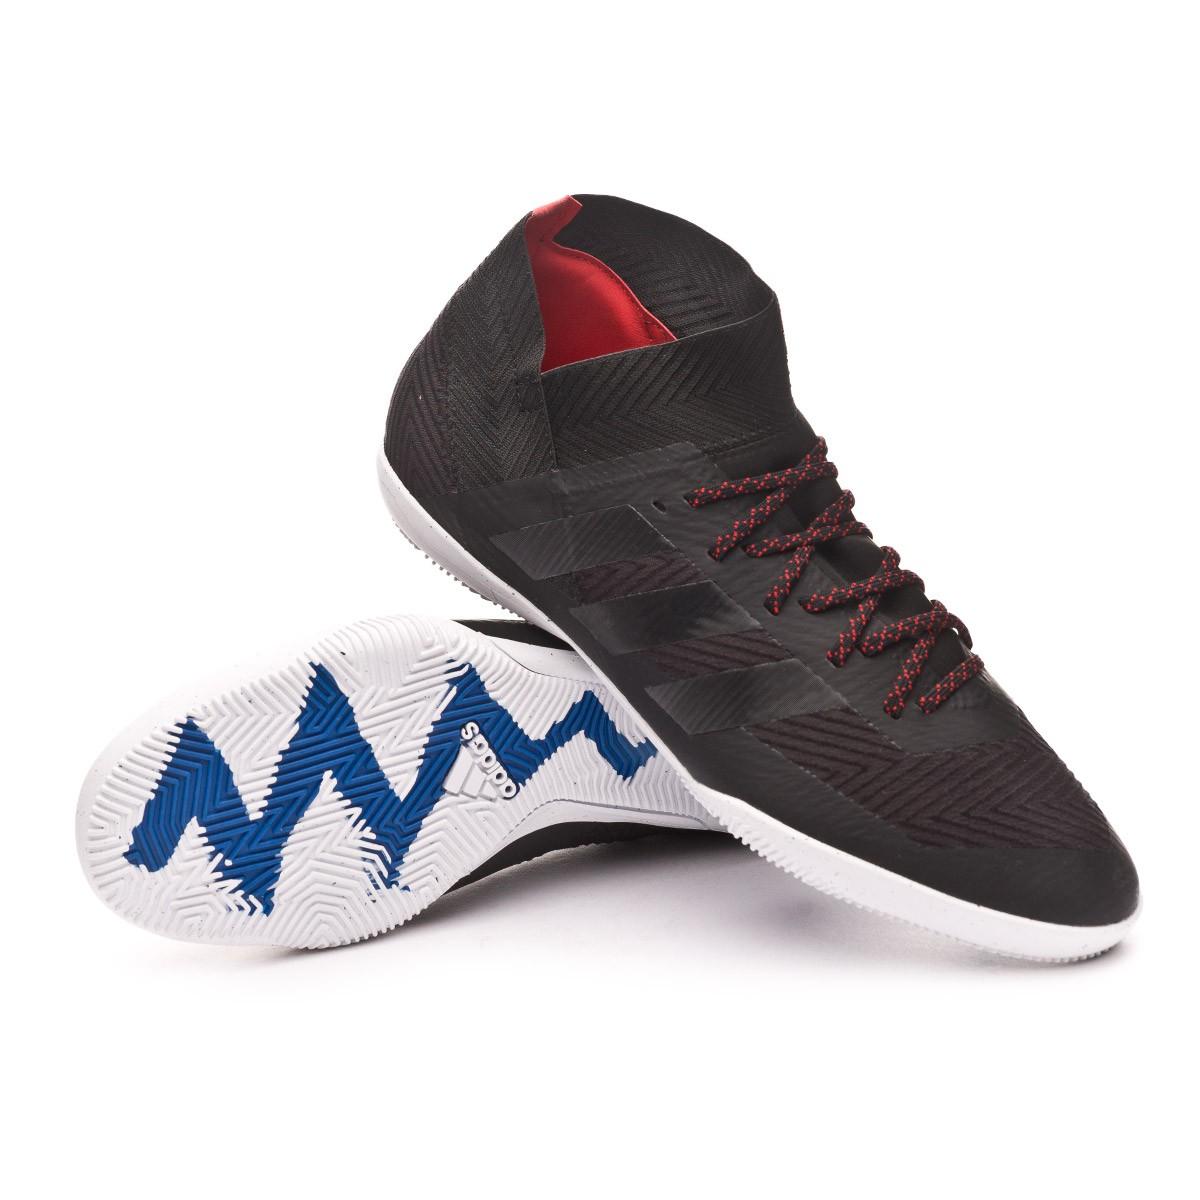 Automáticamente Desventaja nacionalismo  Futsal Boot adidas Nemeziz Tango 18.3 IN Core black-Football blue -  Football store Fútbol Emotion